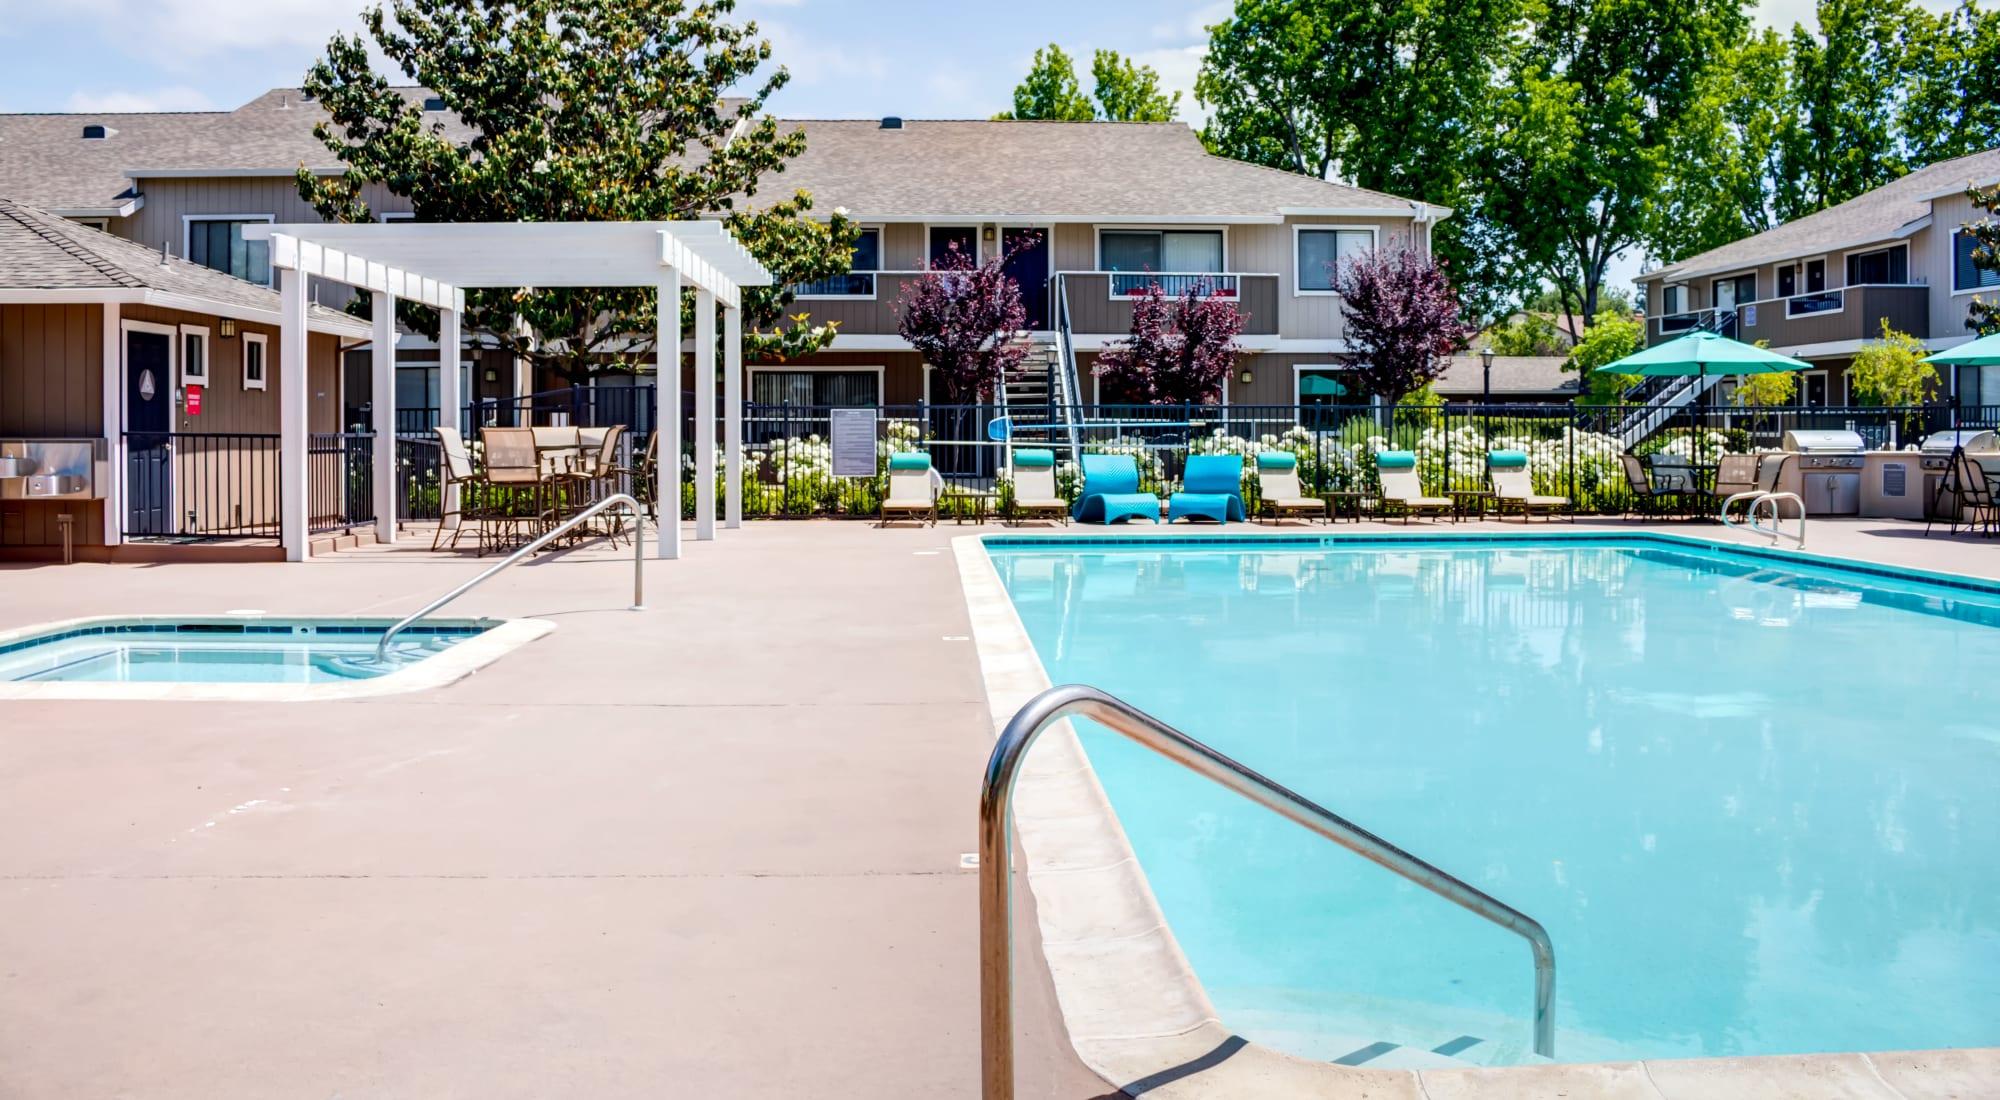 Apply to live at Sofi Berryessa in San Jose, California